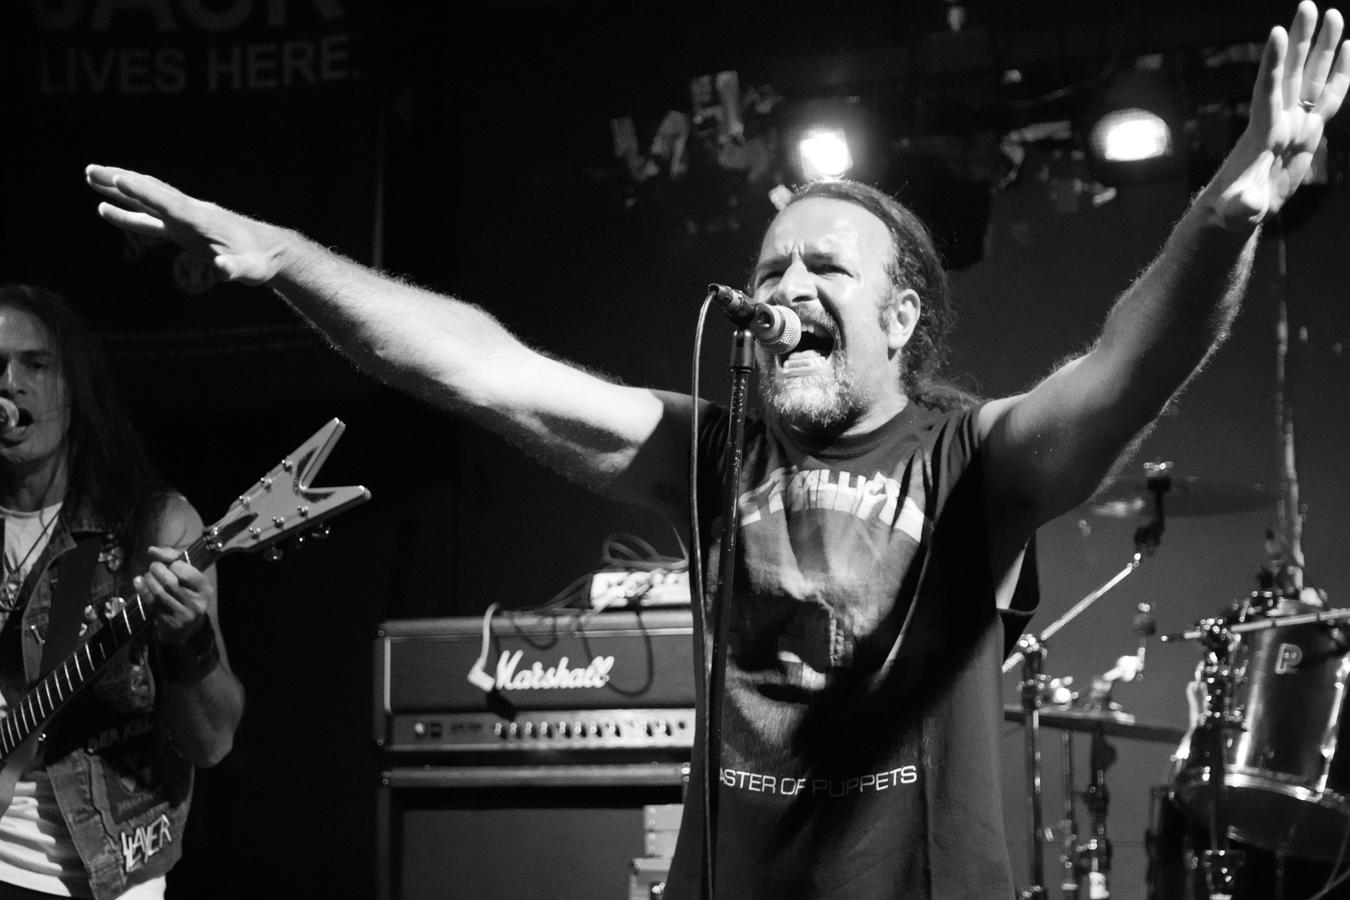 anguishforce blueroseclub 170519 9 1 - Efesto Metal Fest - Bresso (MI) - live